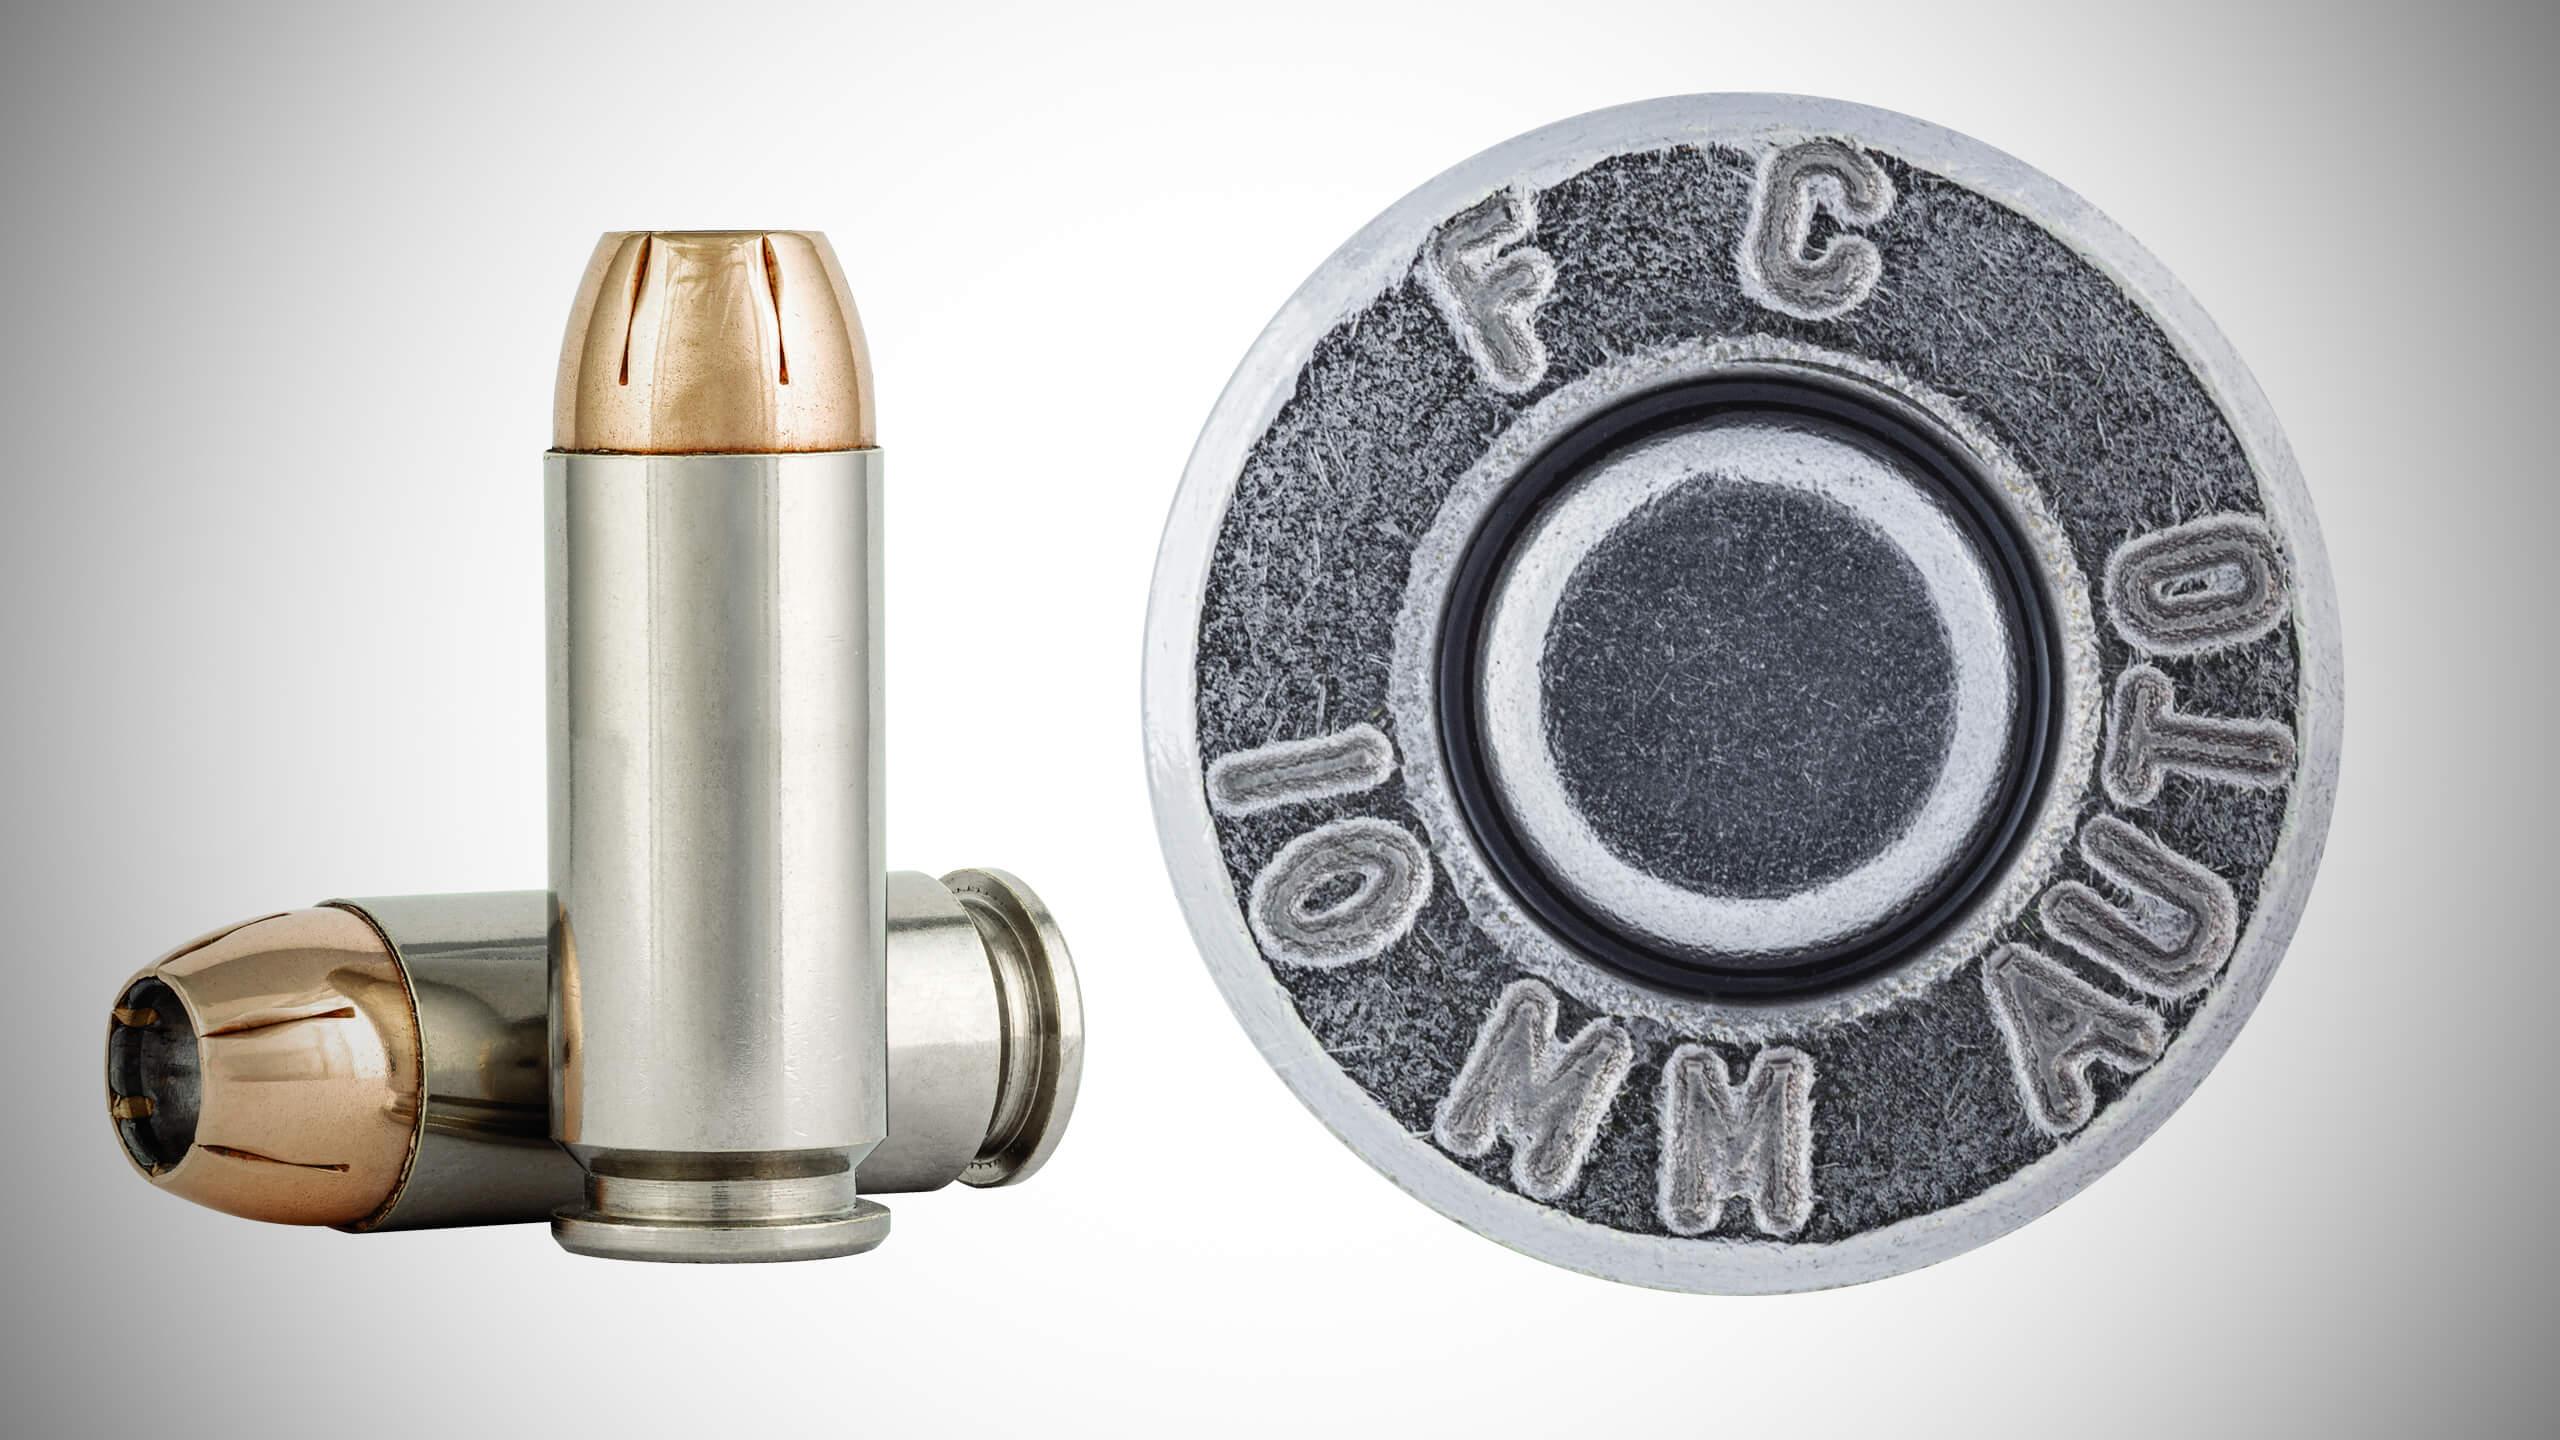 Top Federal 10mm Ammunition Loads